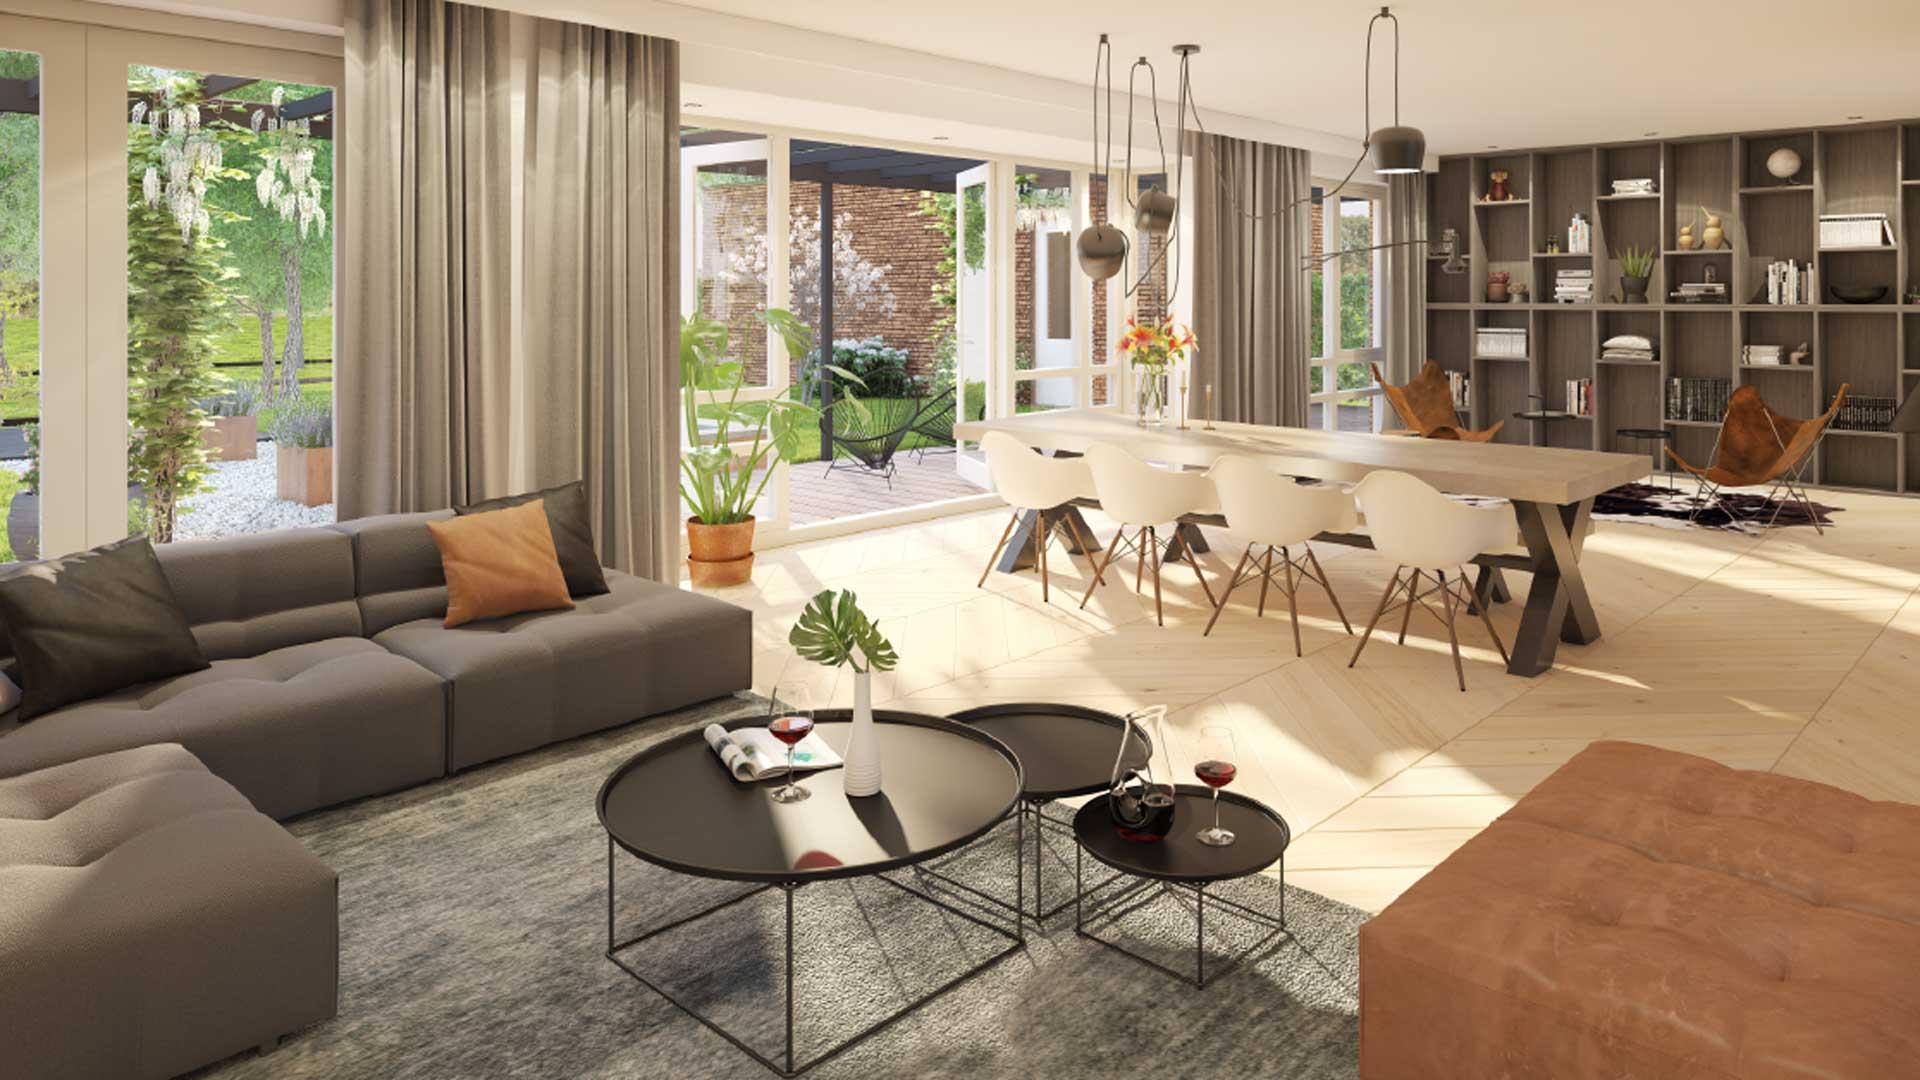 Bunderhof-Werk-yoreM-nieuwbouwwoning